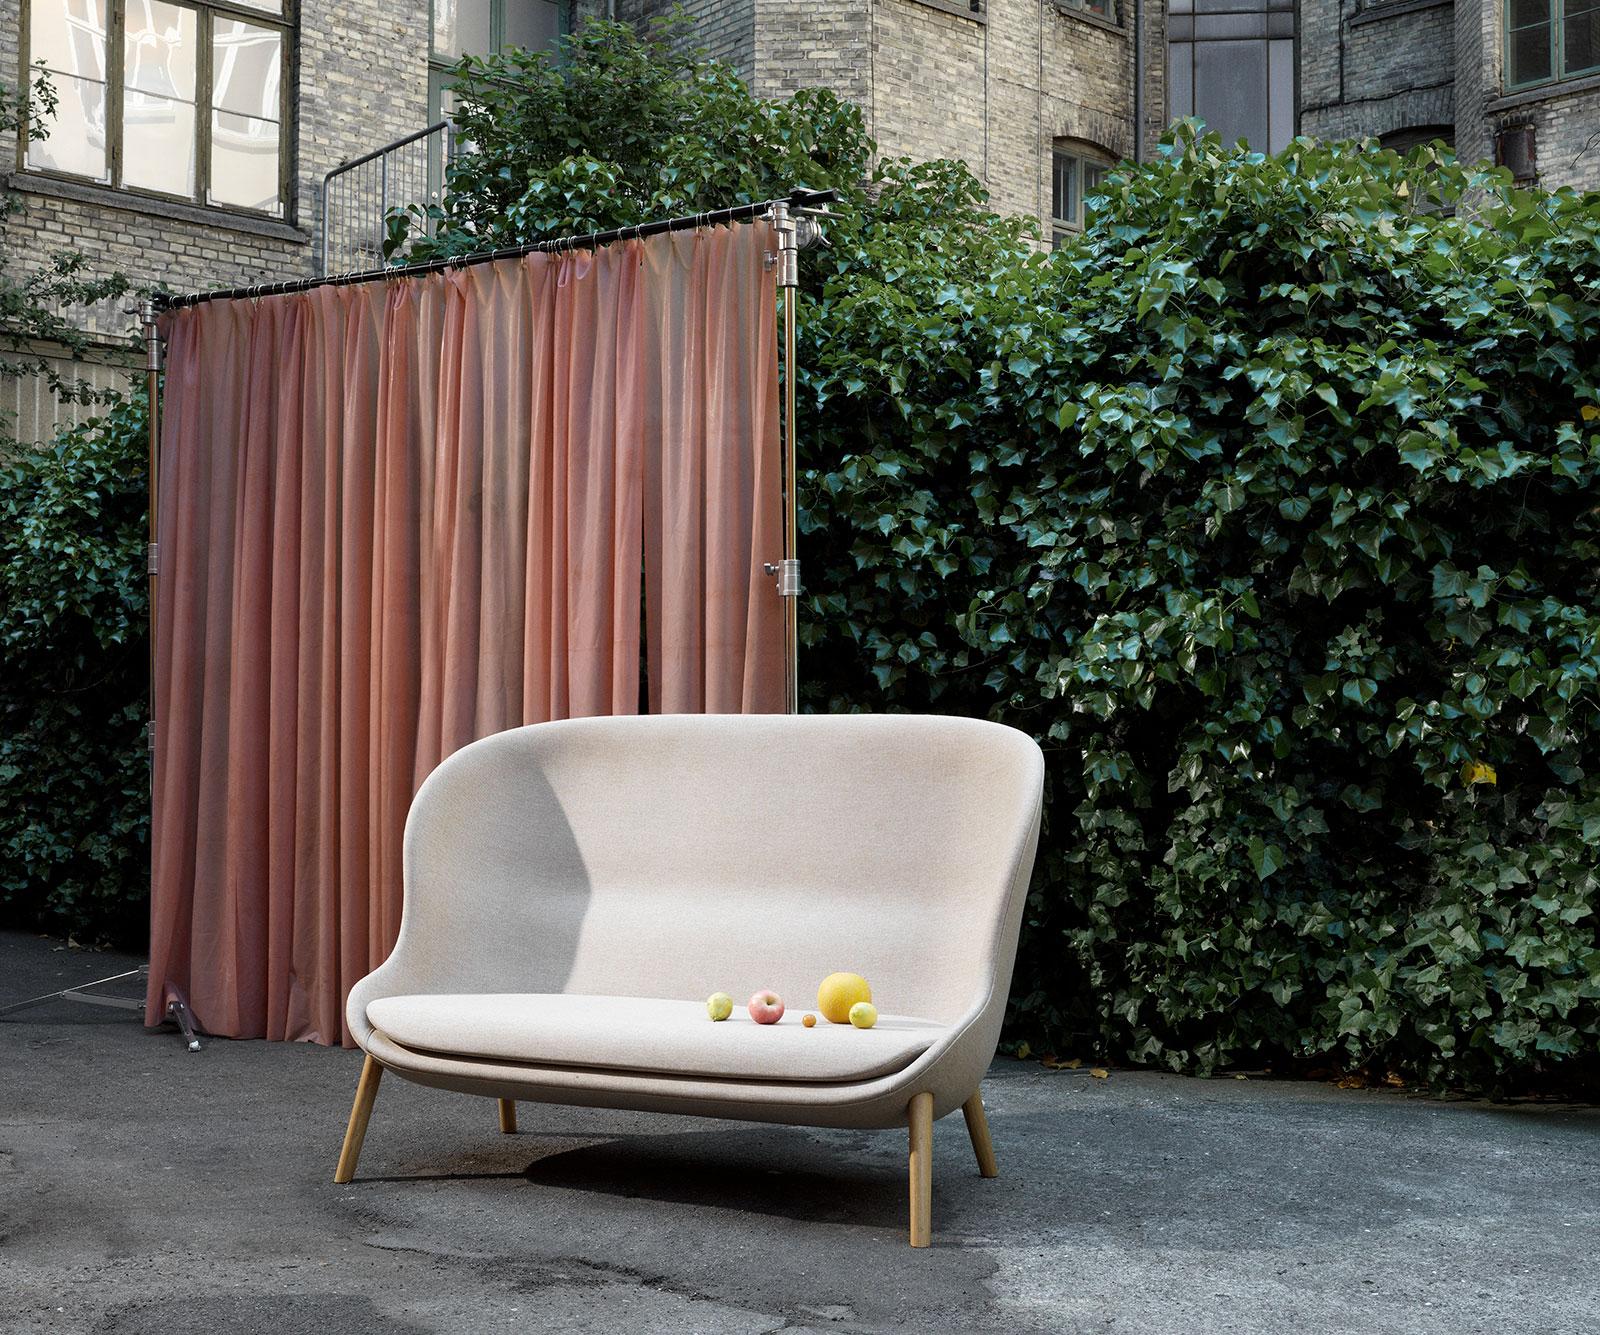 norman copenhagen hug lounge chair living scandinavian home.jpg